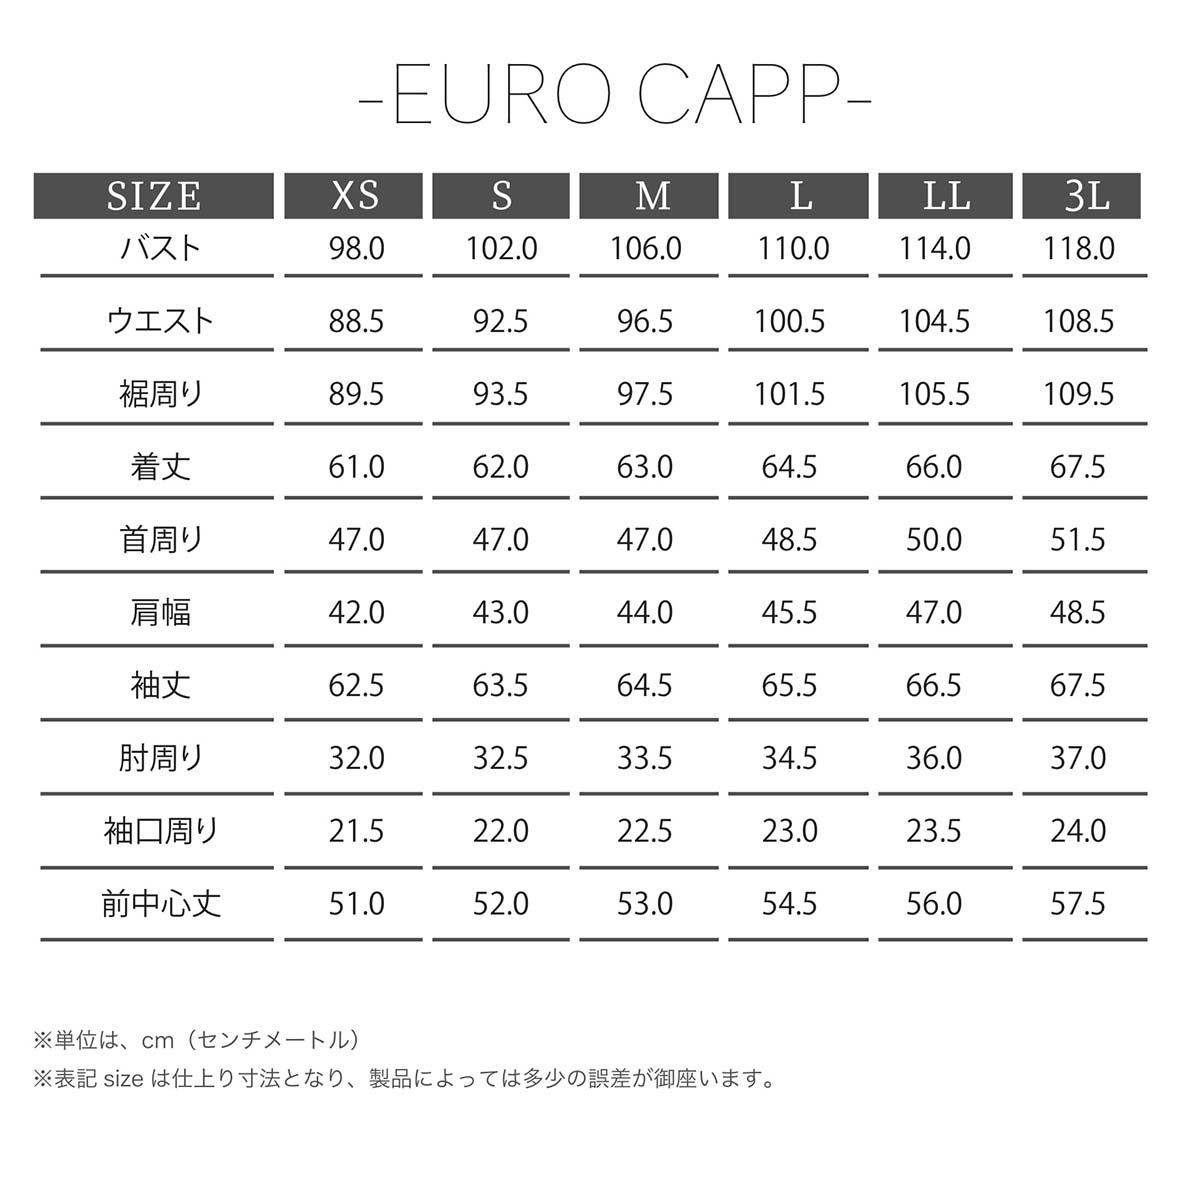 KADOYA(カドヤ) K'S LEATHER  EURO CAPP ユーロカップ フード着脱式 ブラック